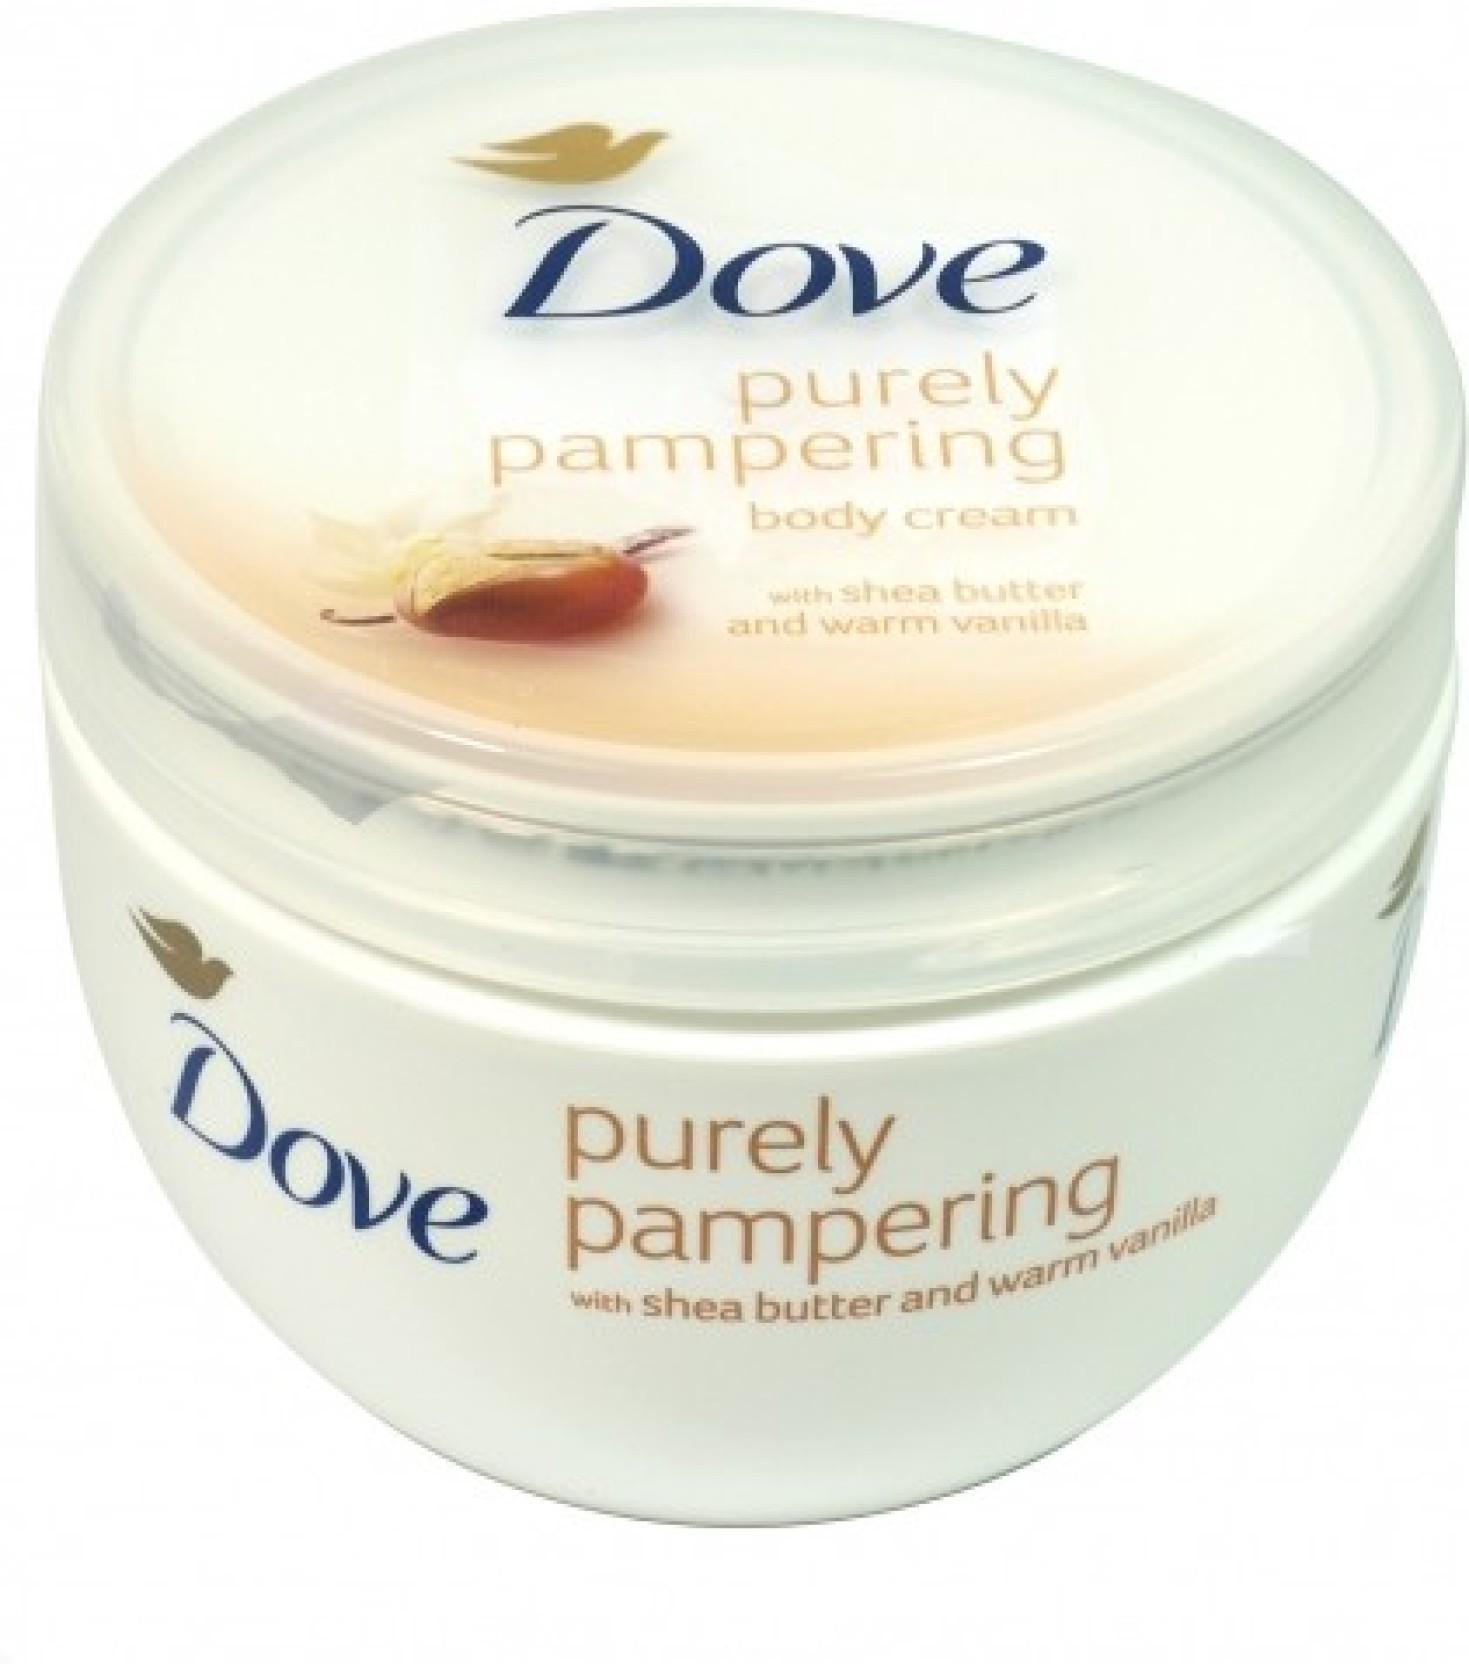 Dove Purely Pampering Body Cream